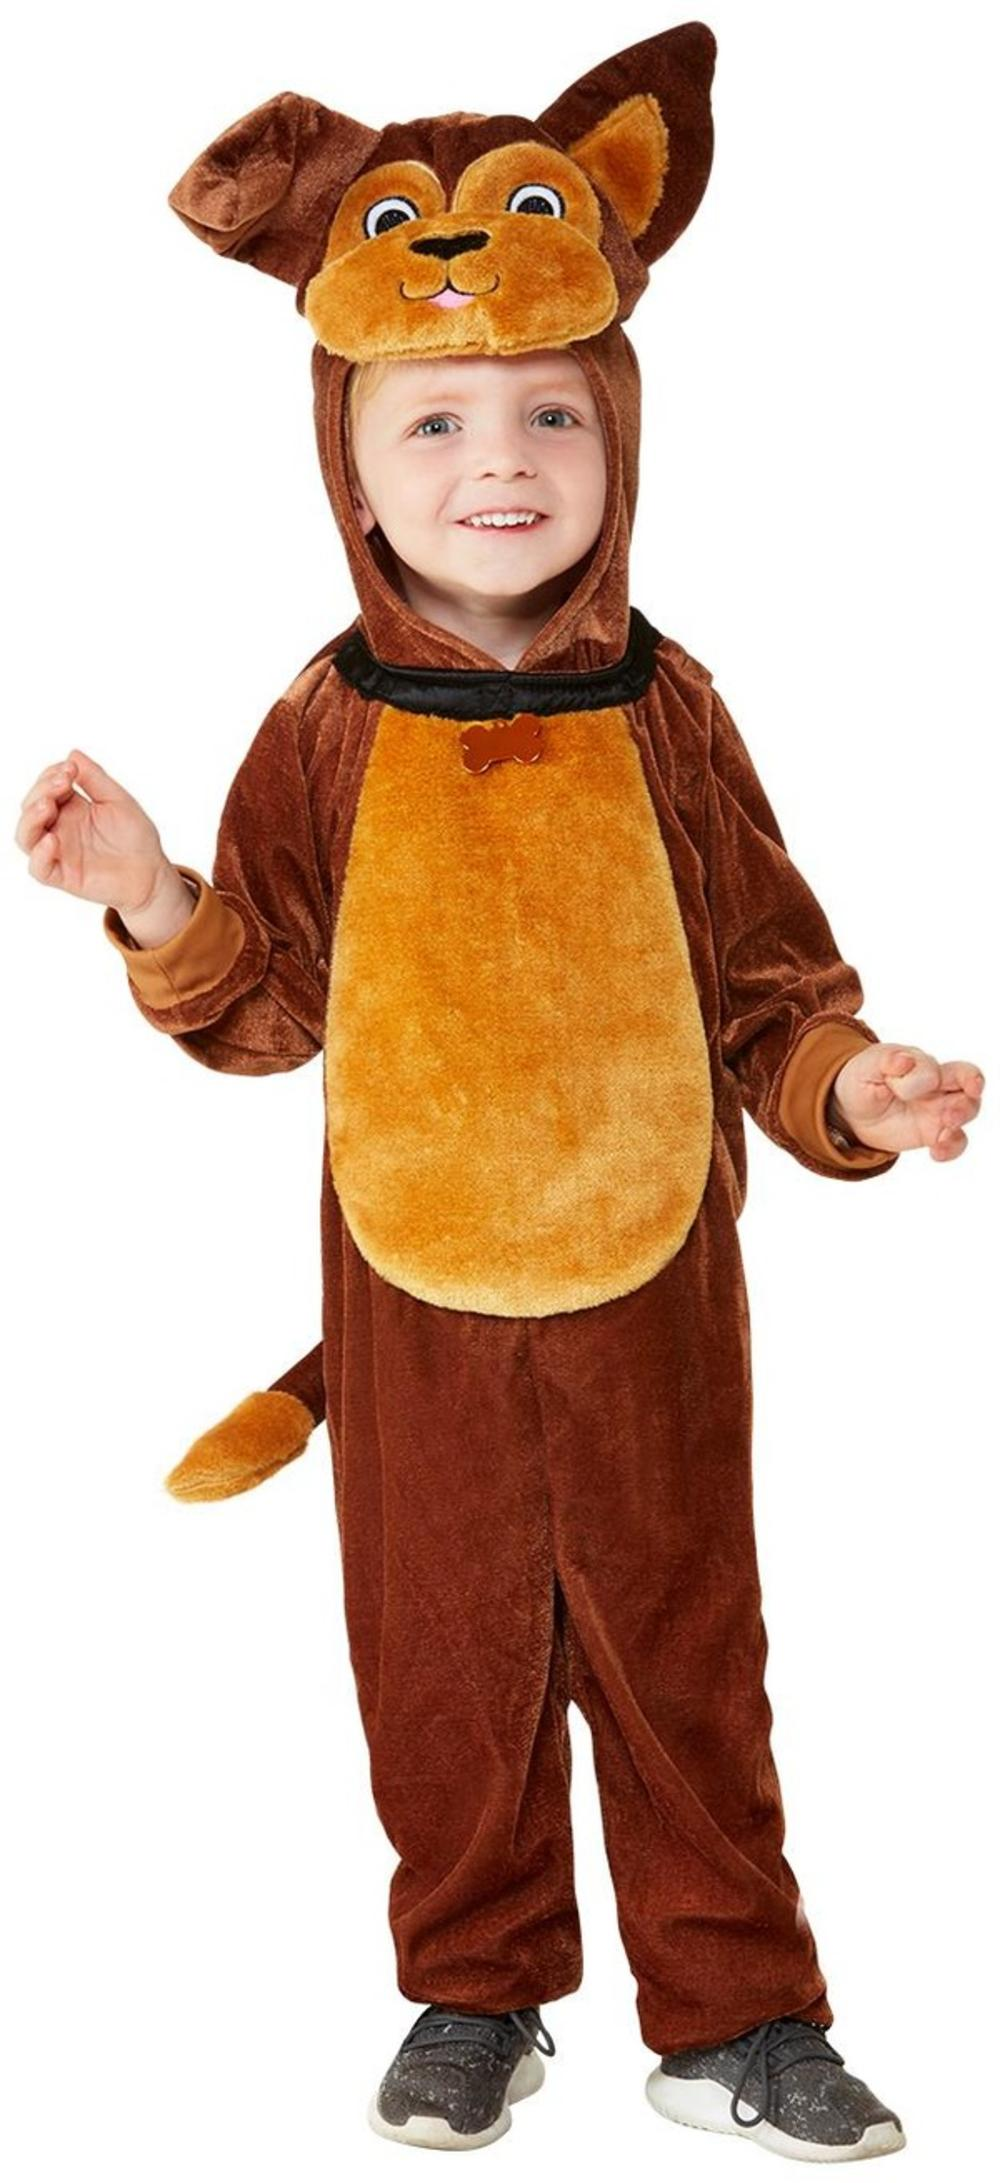 Dog Kids Fancy Dress Pet Animal World Book Day Girls Boys Toddler Costume Outfit